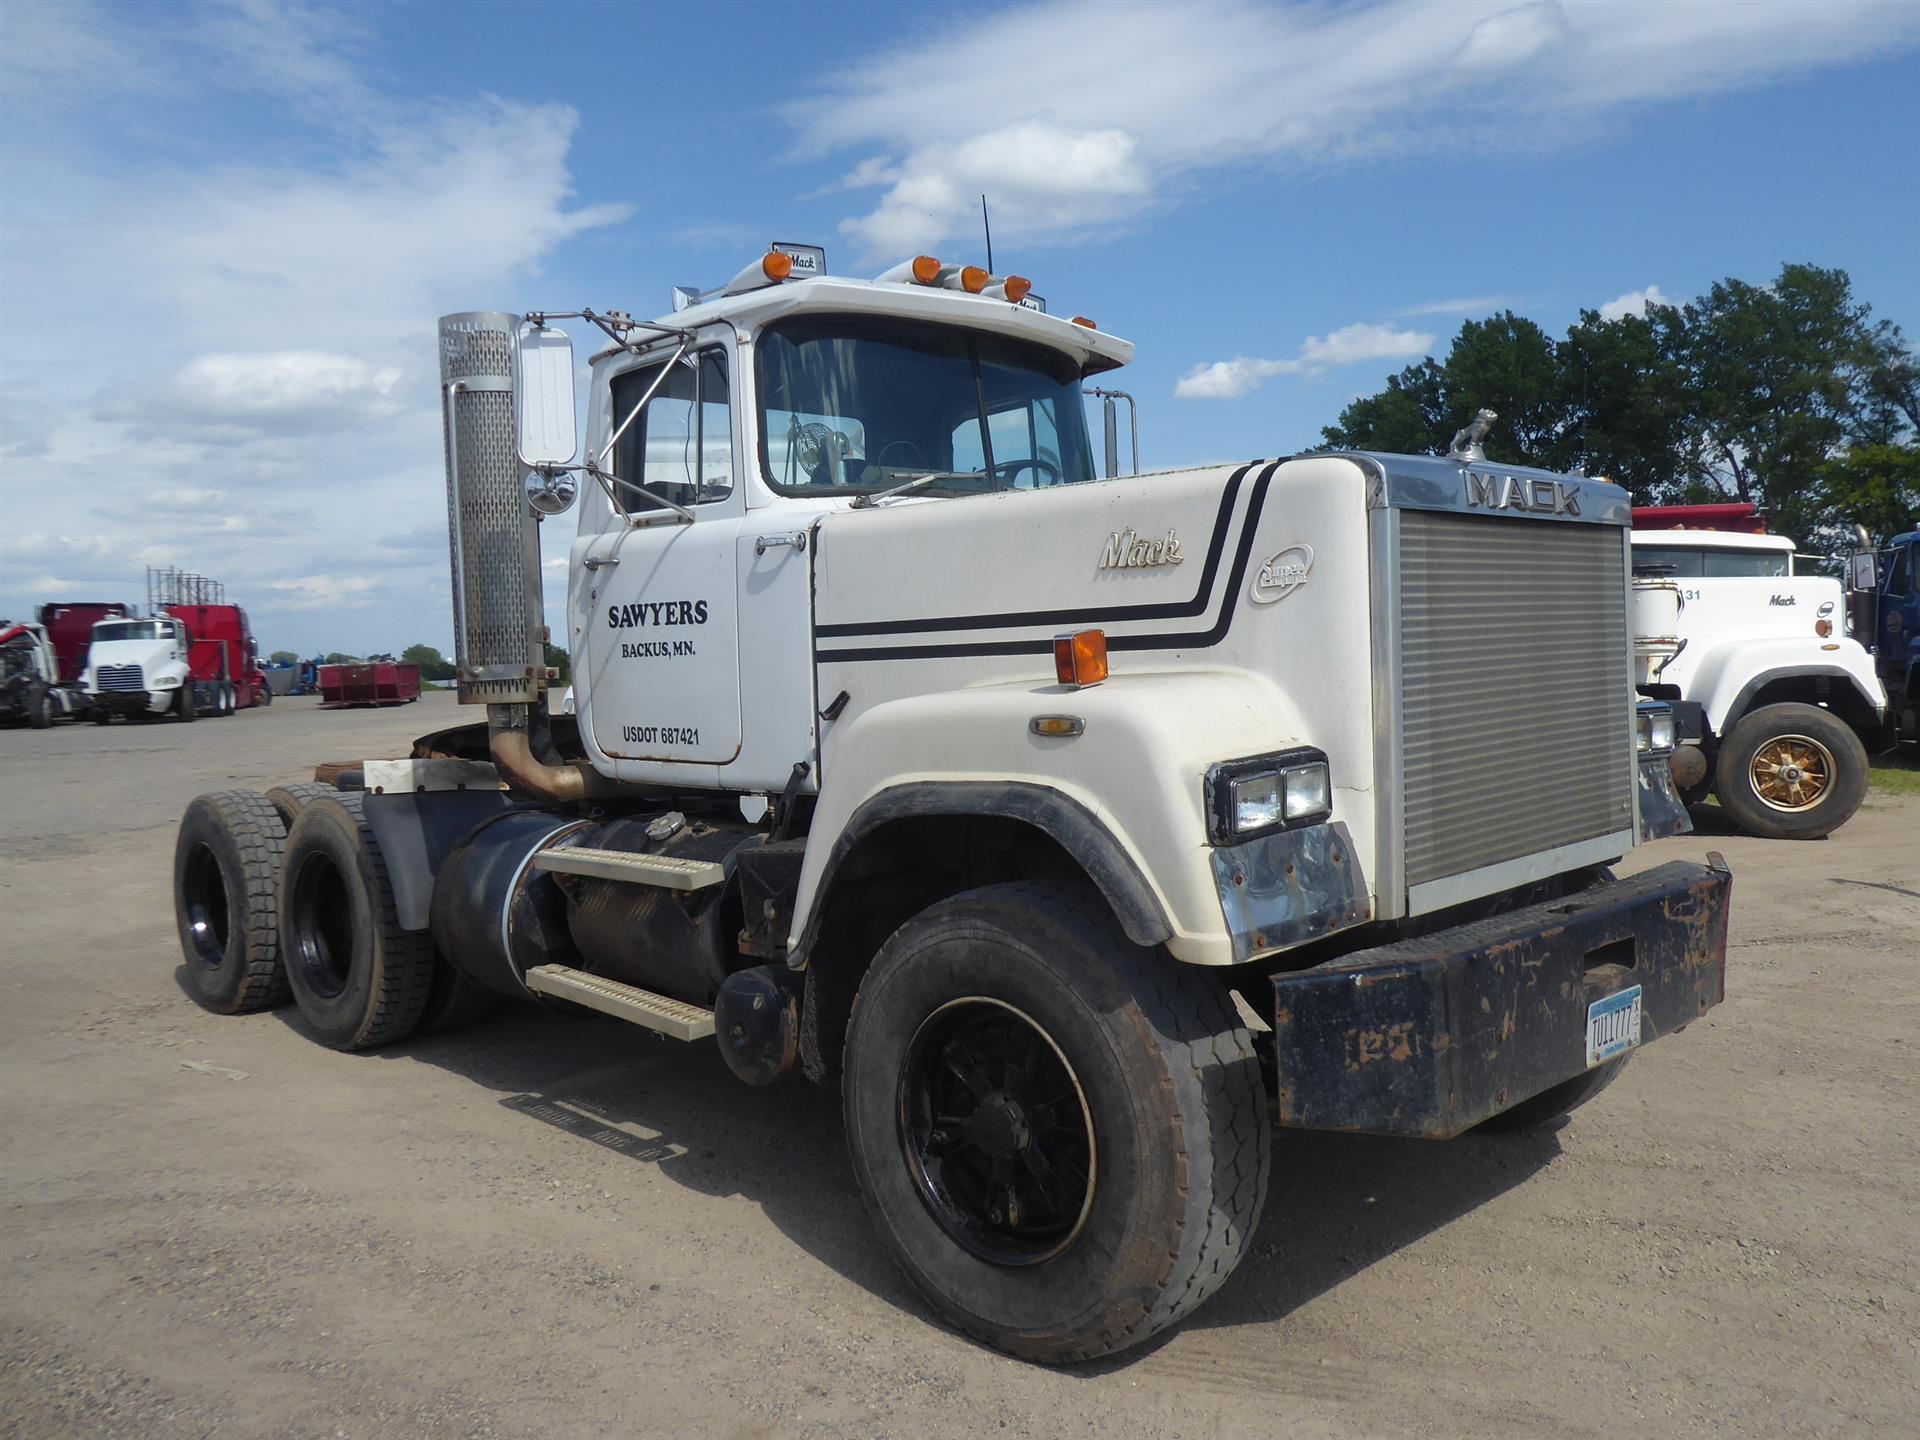 1989 Mack rw613 for sale-59246711